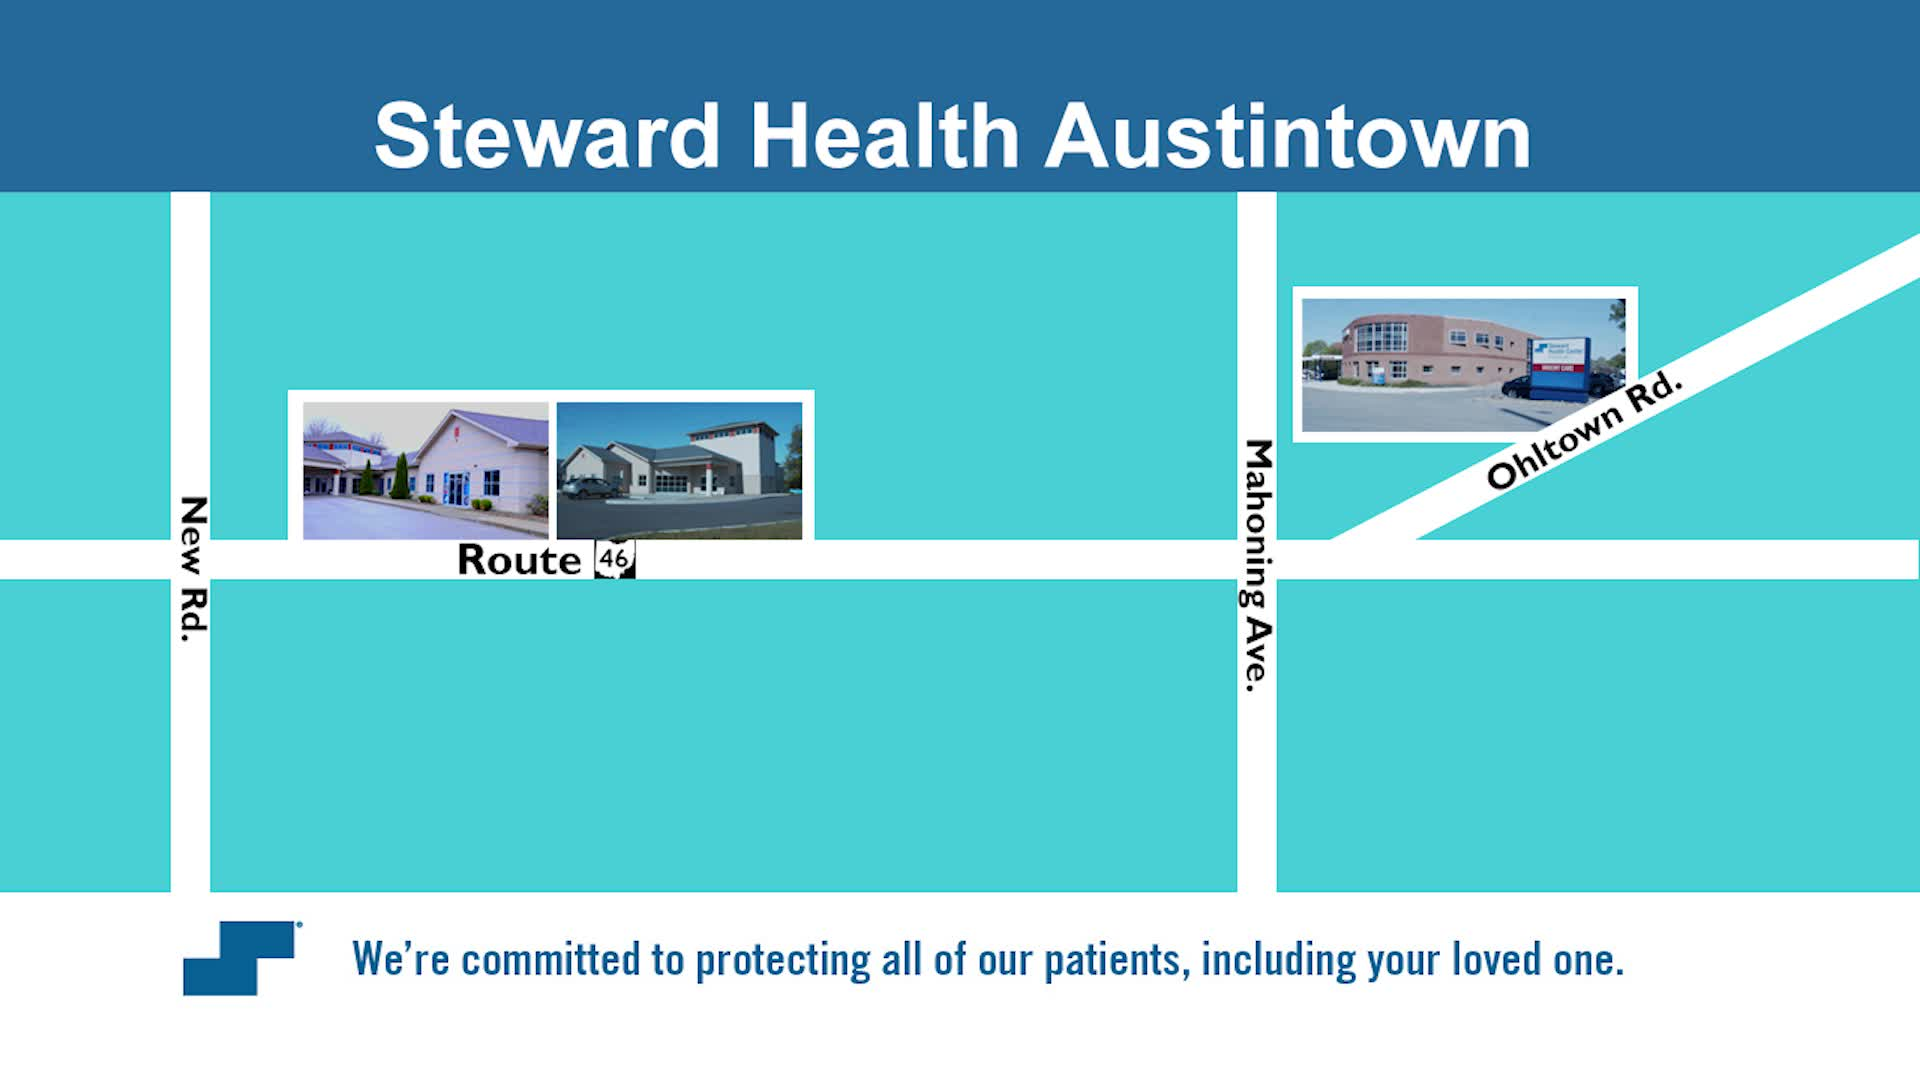 Steward Health Austintown